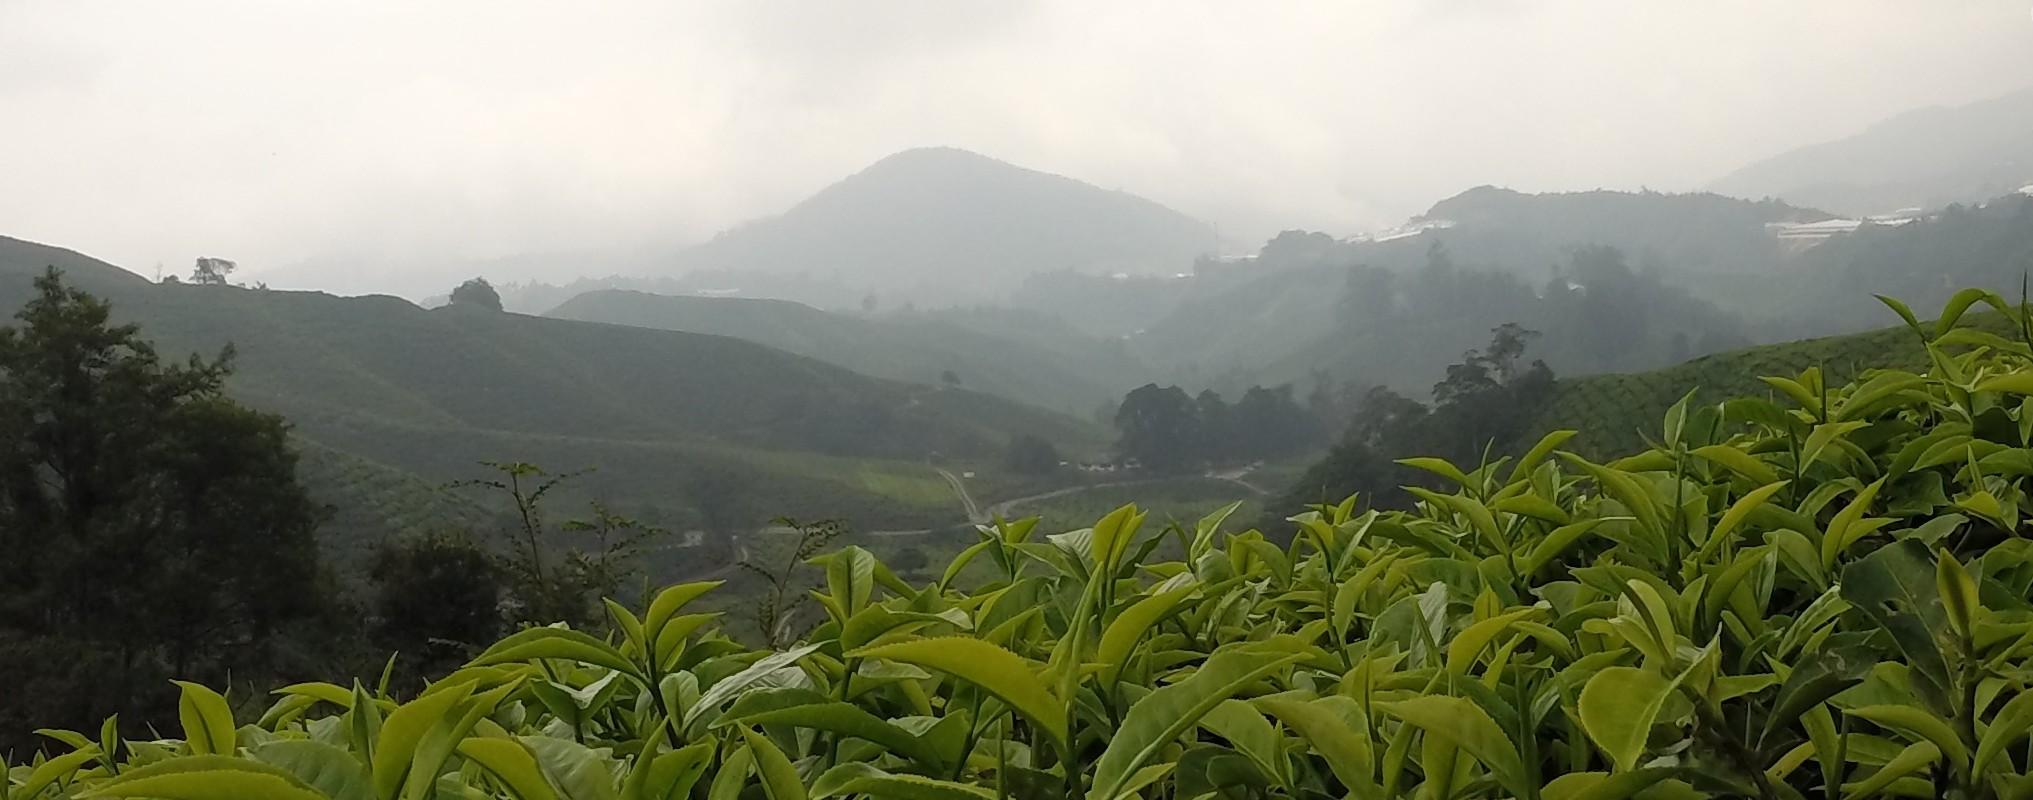 Plantations Operations (Tea, Coffee, Rubber ...)